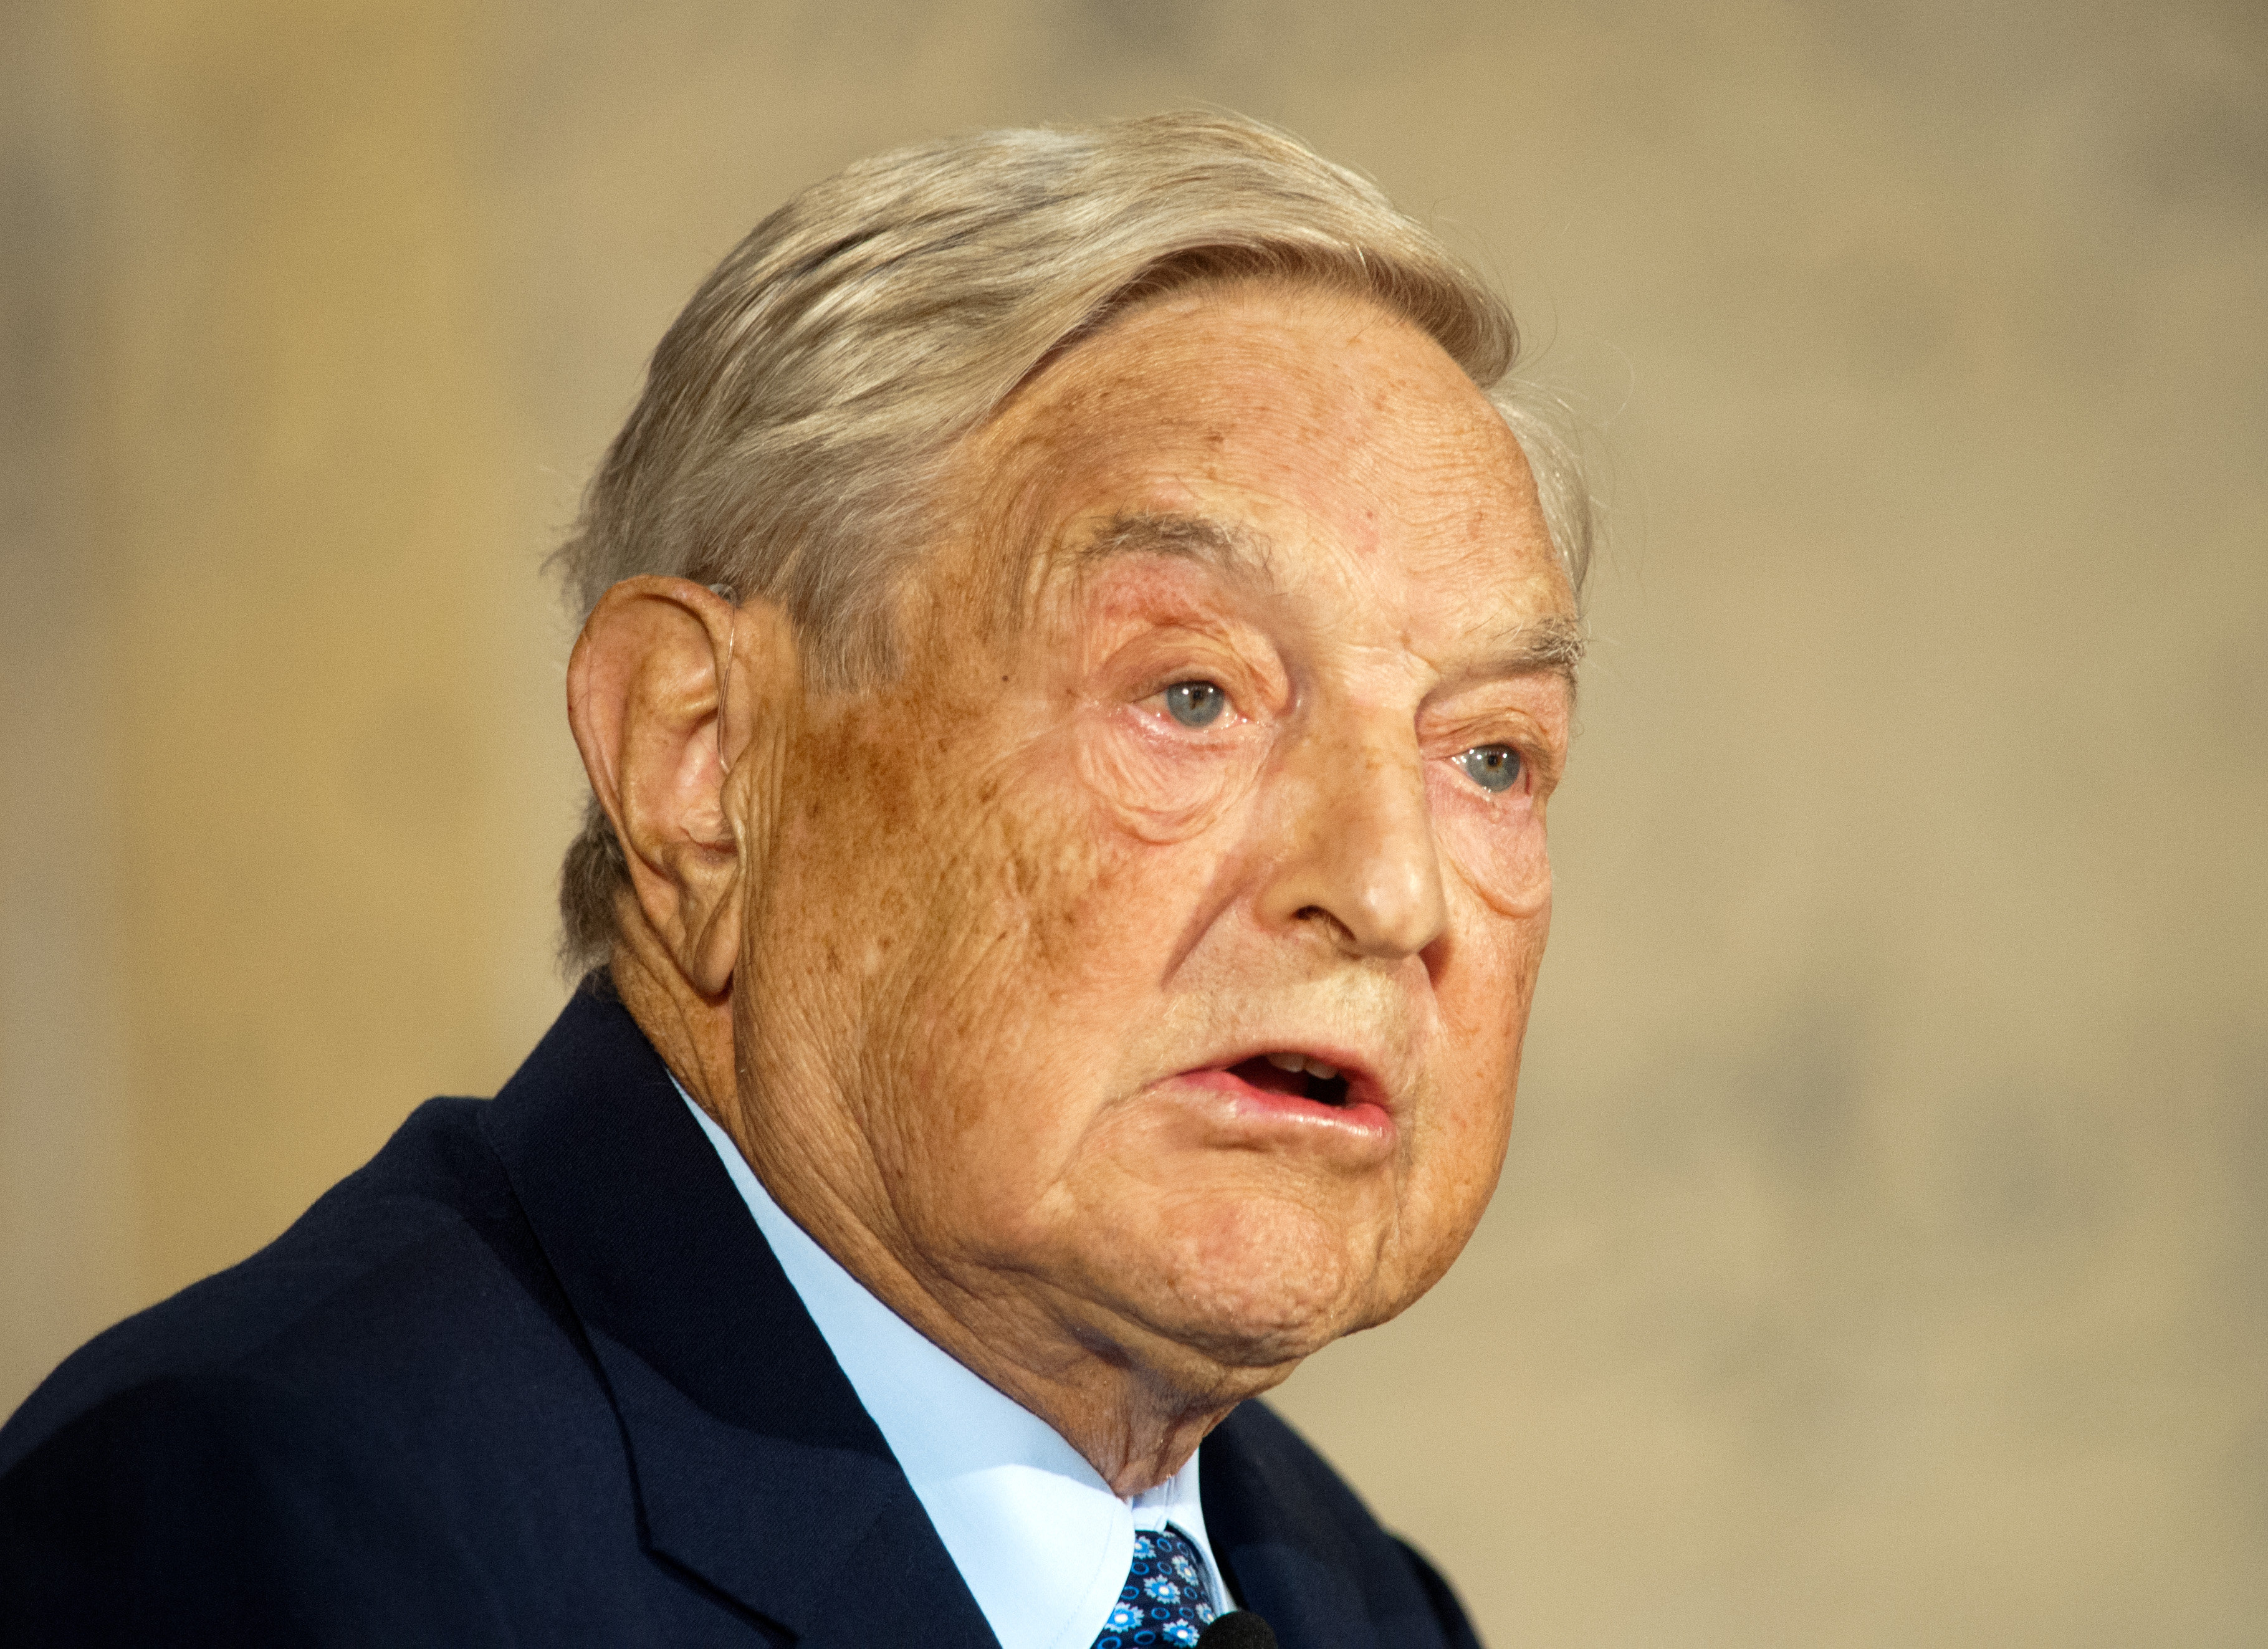 На фото престарелый миллиардер Сорос